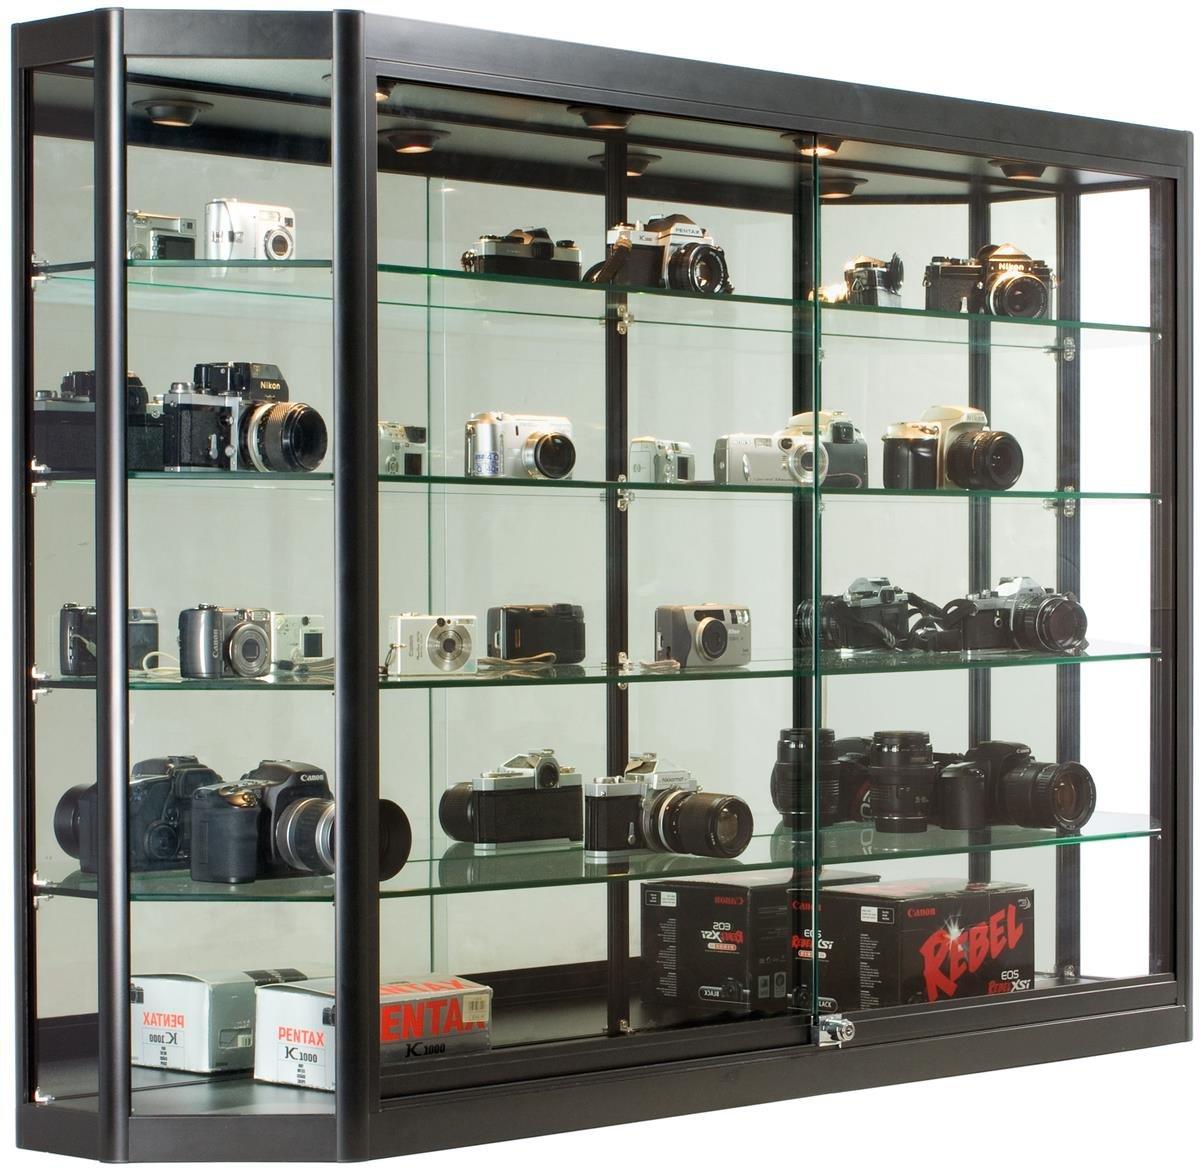 Displays2go 60'' W x 39.5'' H Glass Illuminated Showcase for Wall Mount, Locking Sliding Doors, Aluminum Construction – Black (WC603912BK)